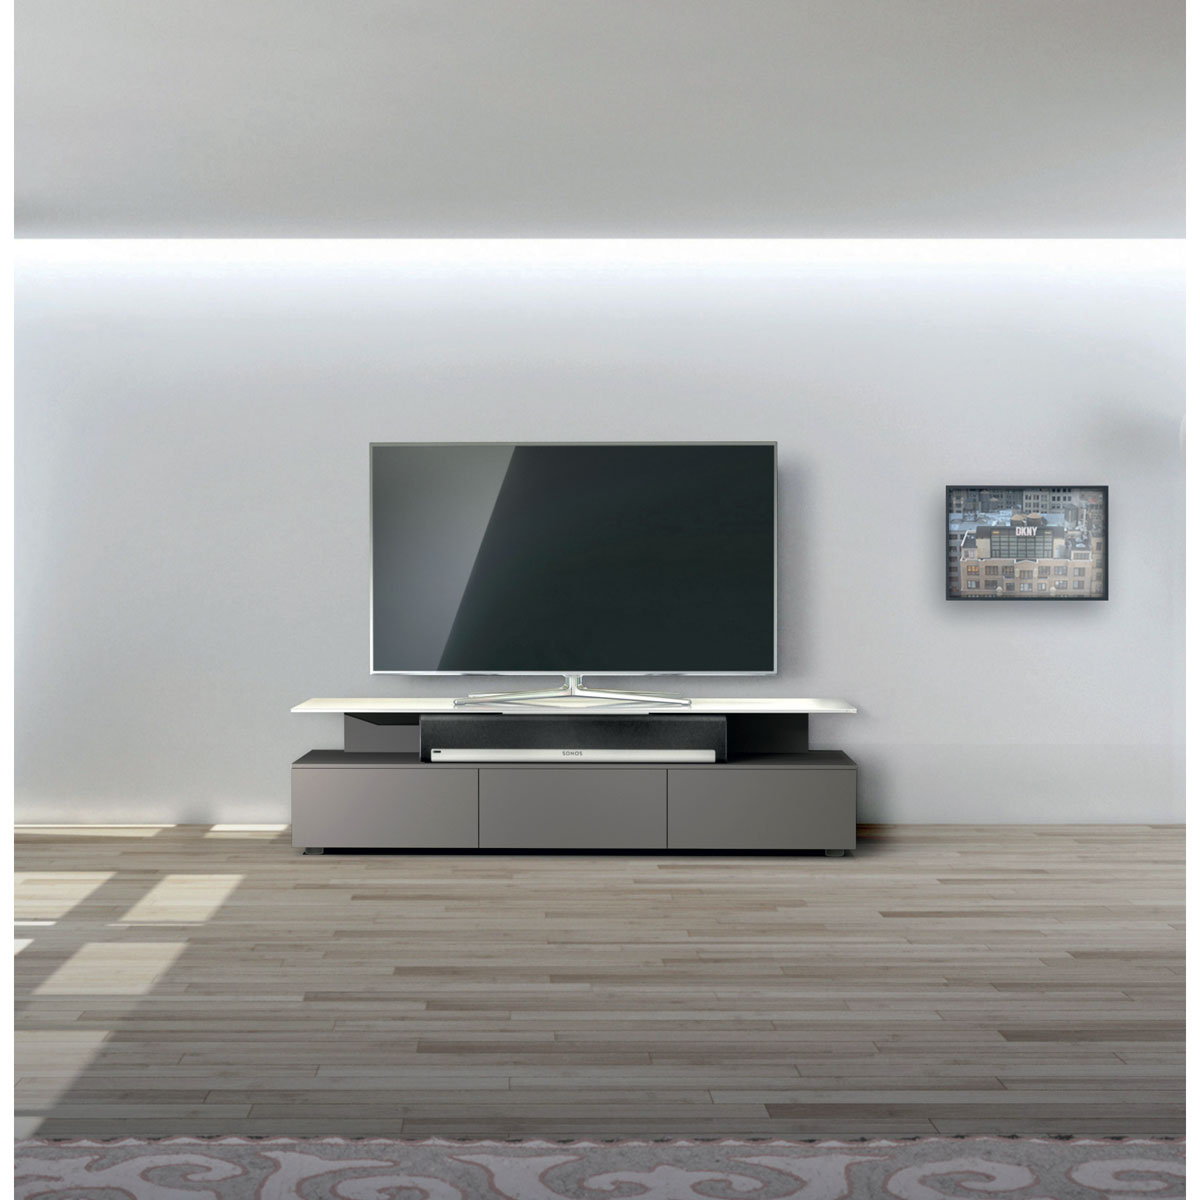 Hifi TV Lowboard. Soundbar Integration möglich. 3 Klappen für Audiogeräte. Modell PE 1650 von Just Racks.